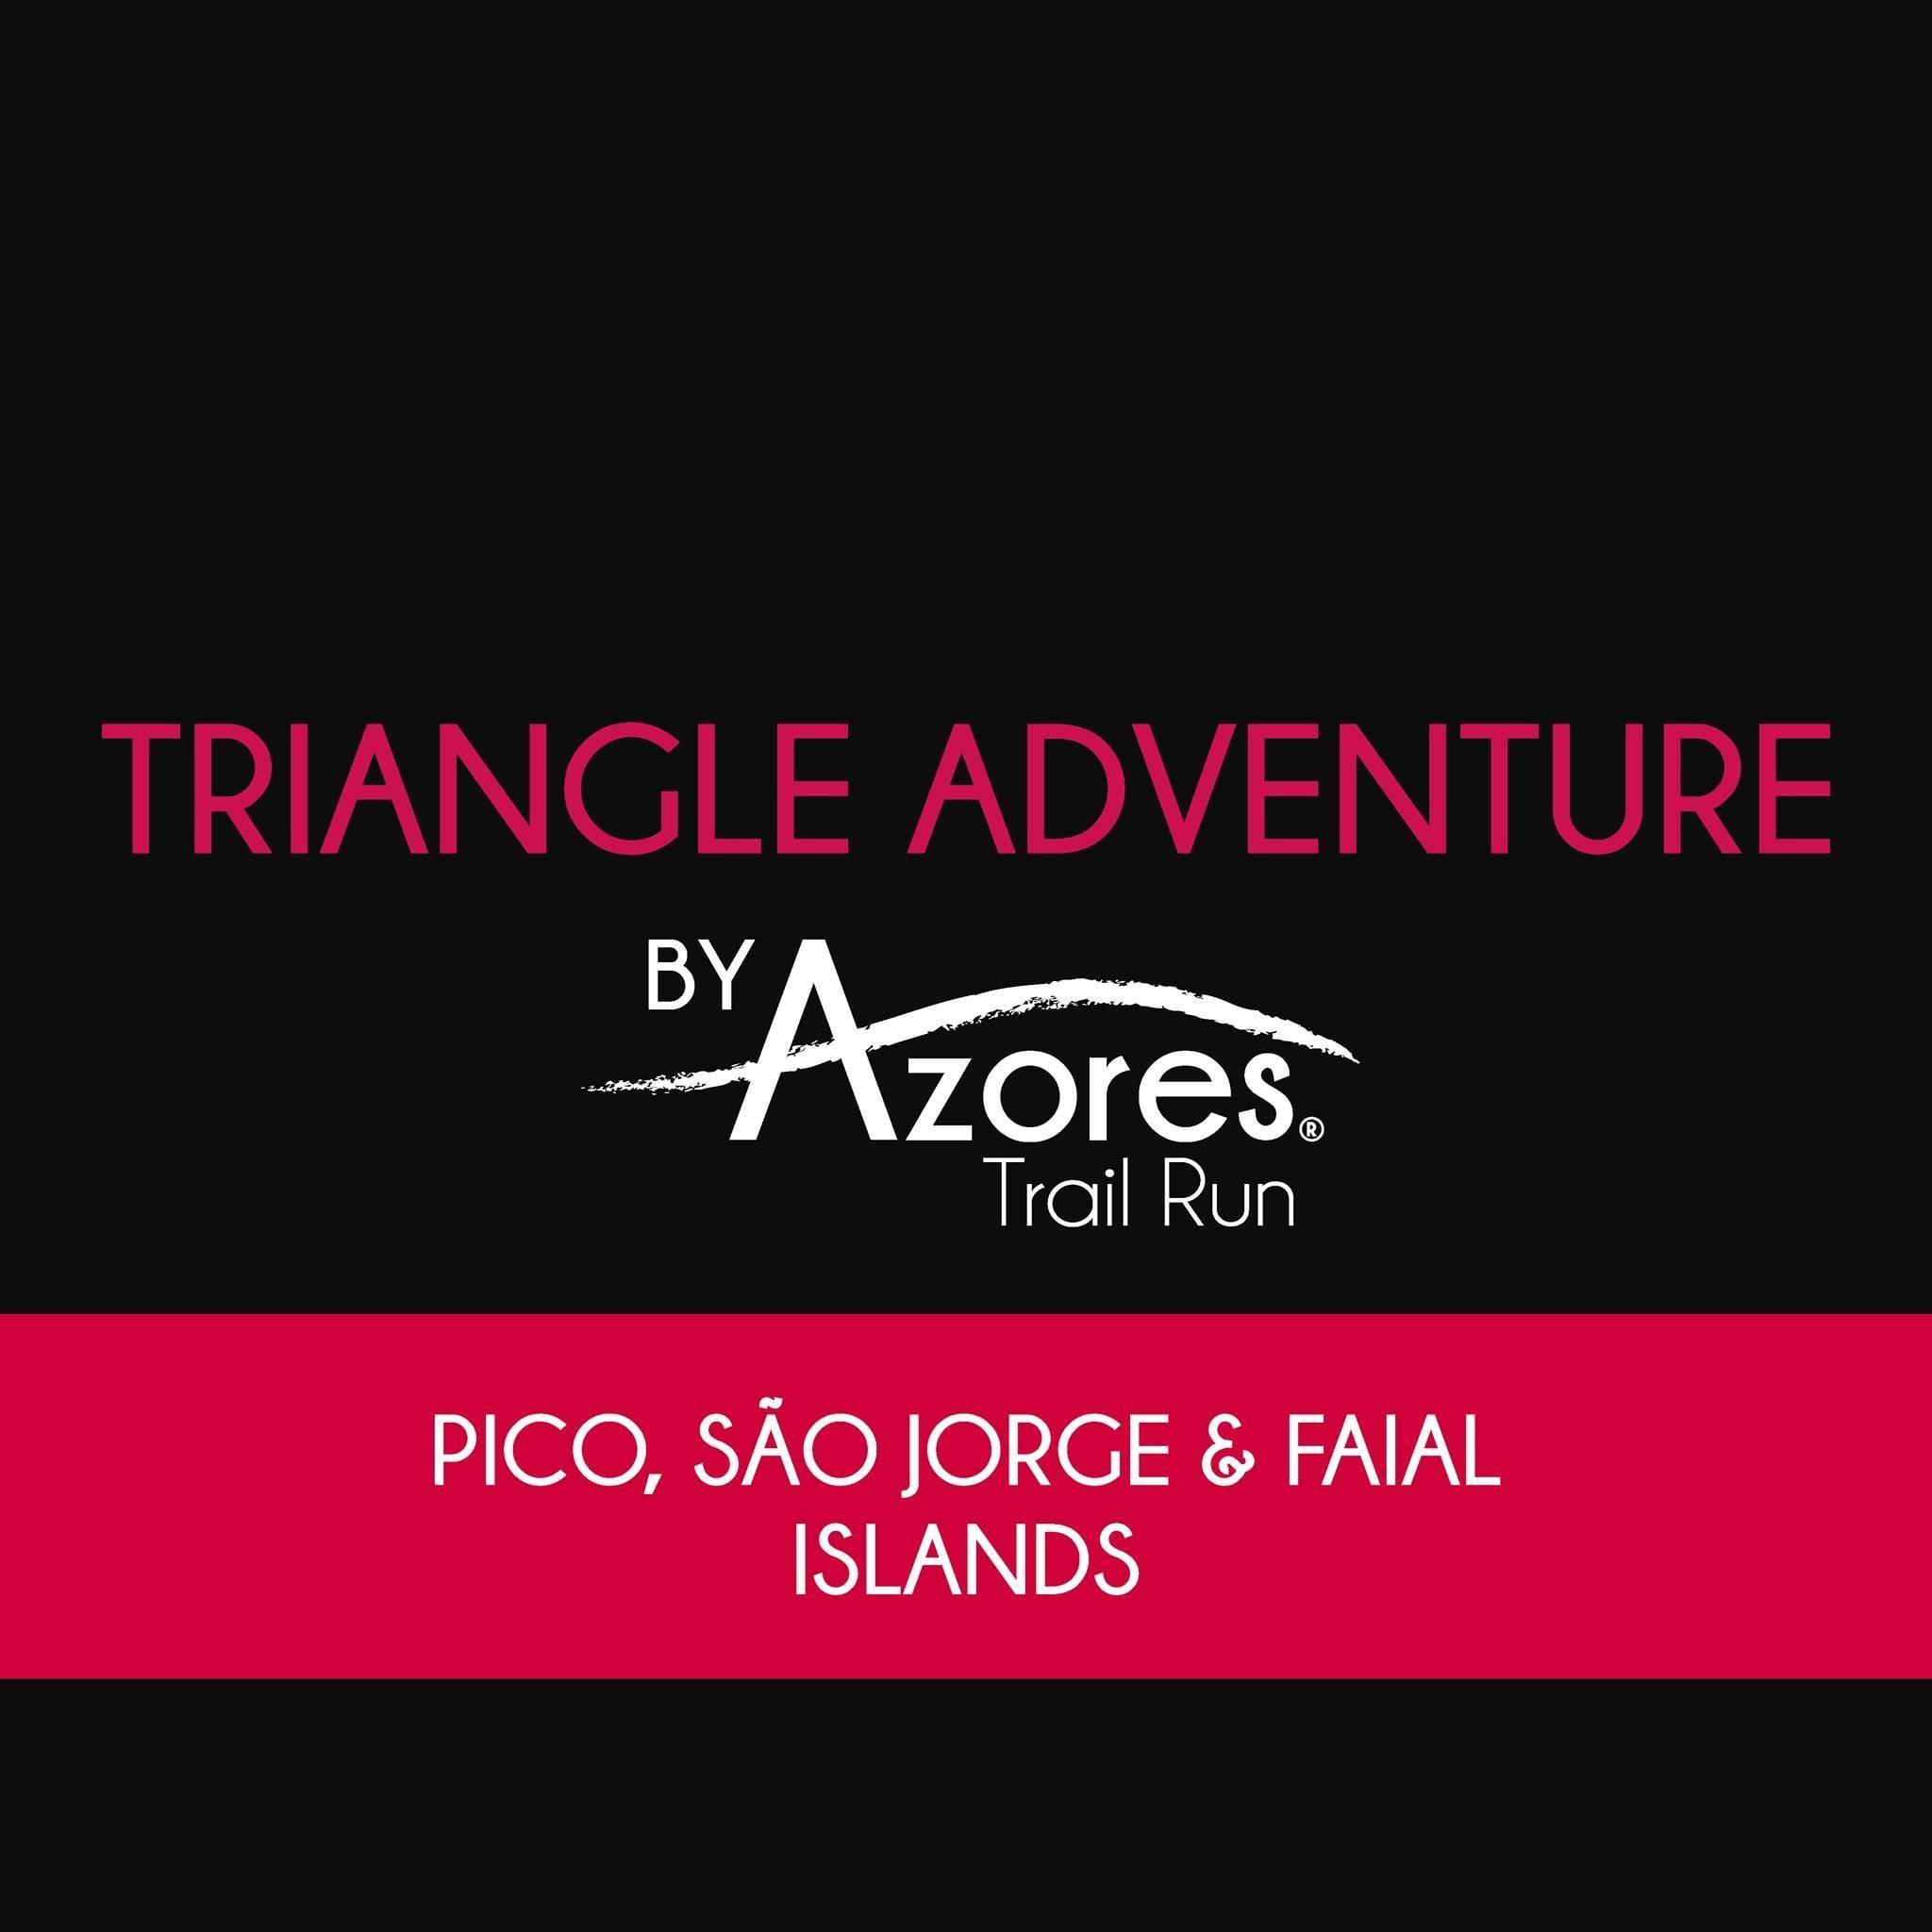 Logo-Triangle-Adventure